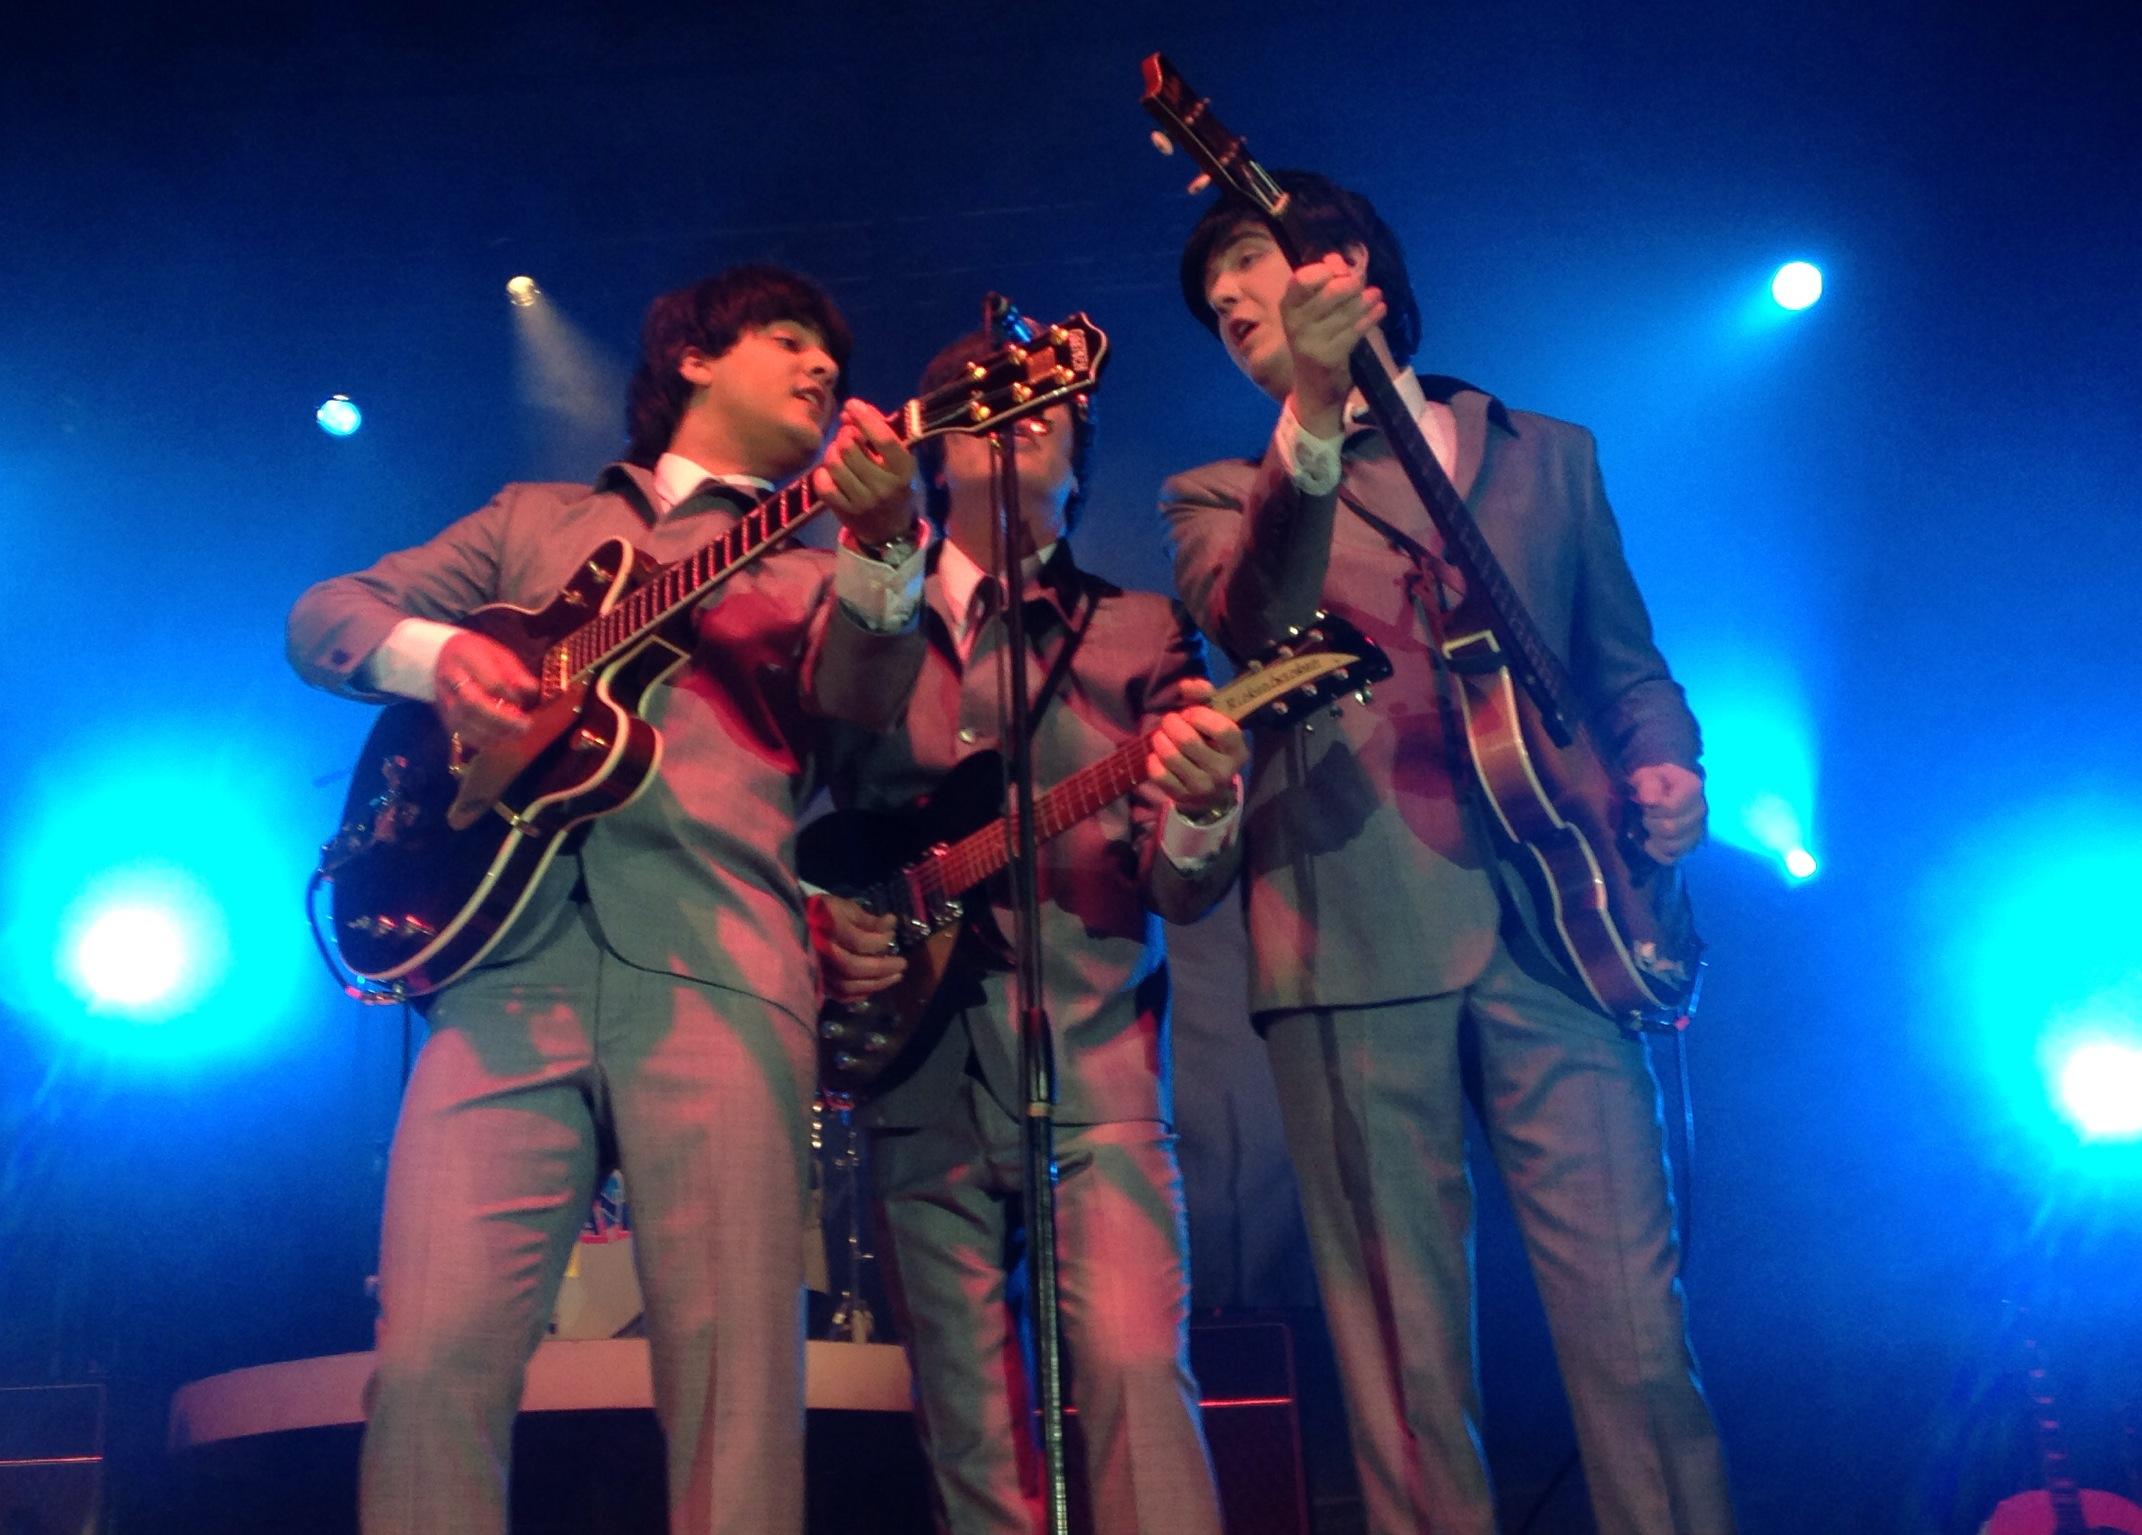 Beatlemania returns to Washington Coliseum